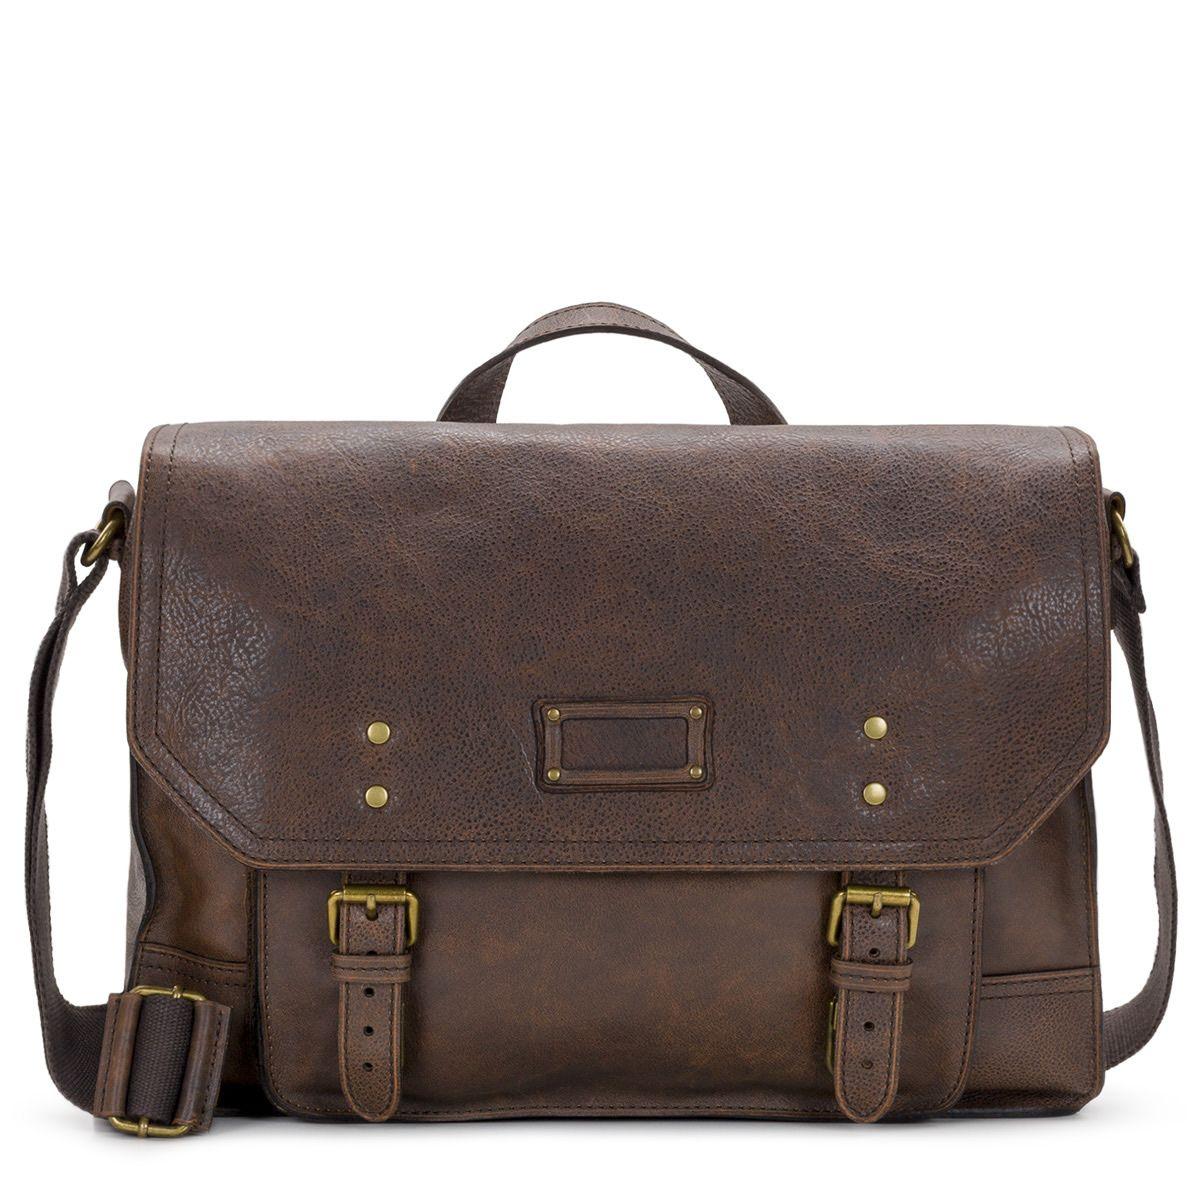 e64737a80e Patricia Nash Handbags - Macy s